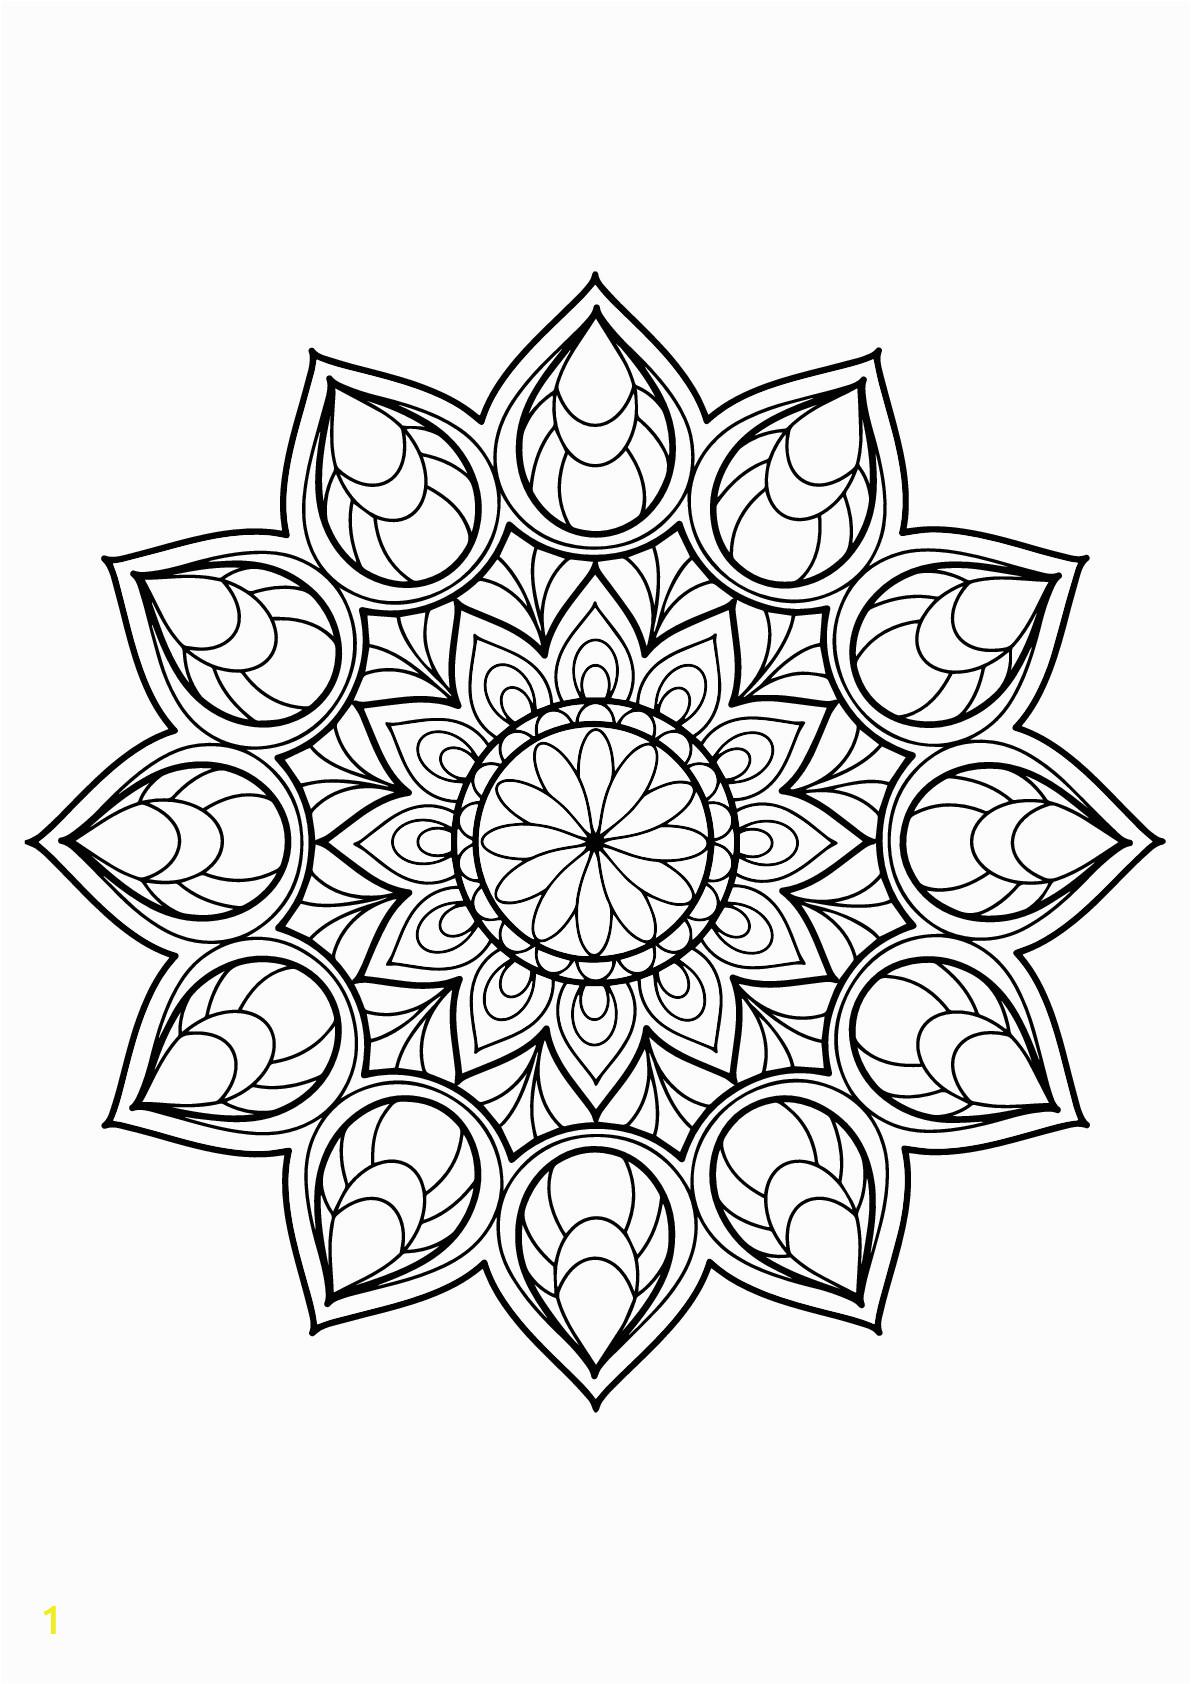 2 image=mandalas mandala from free coloring book for adults 9 1